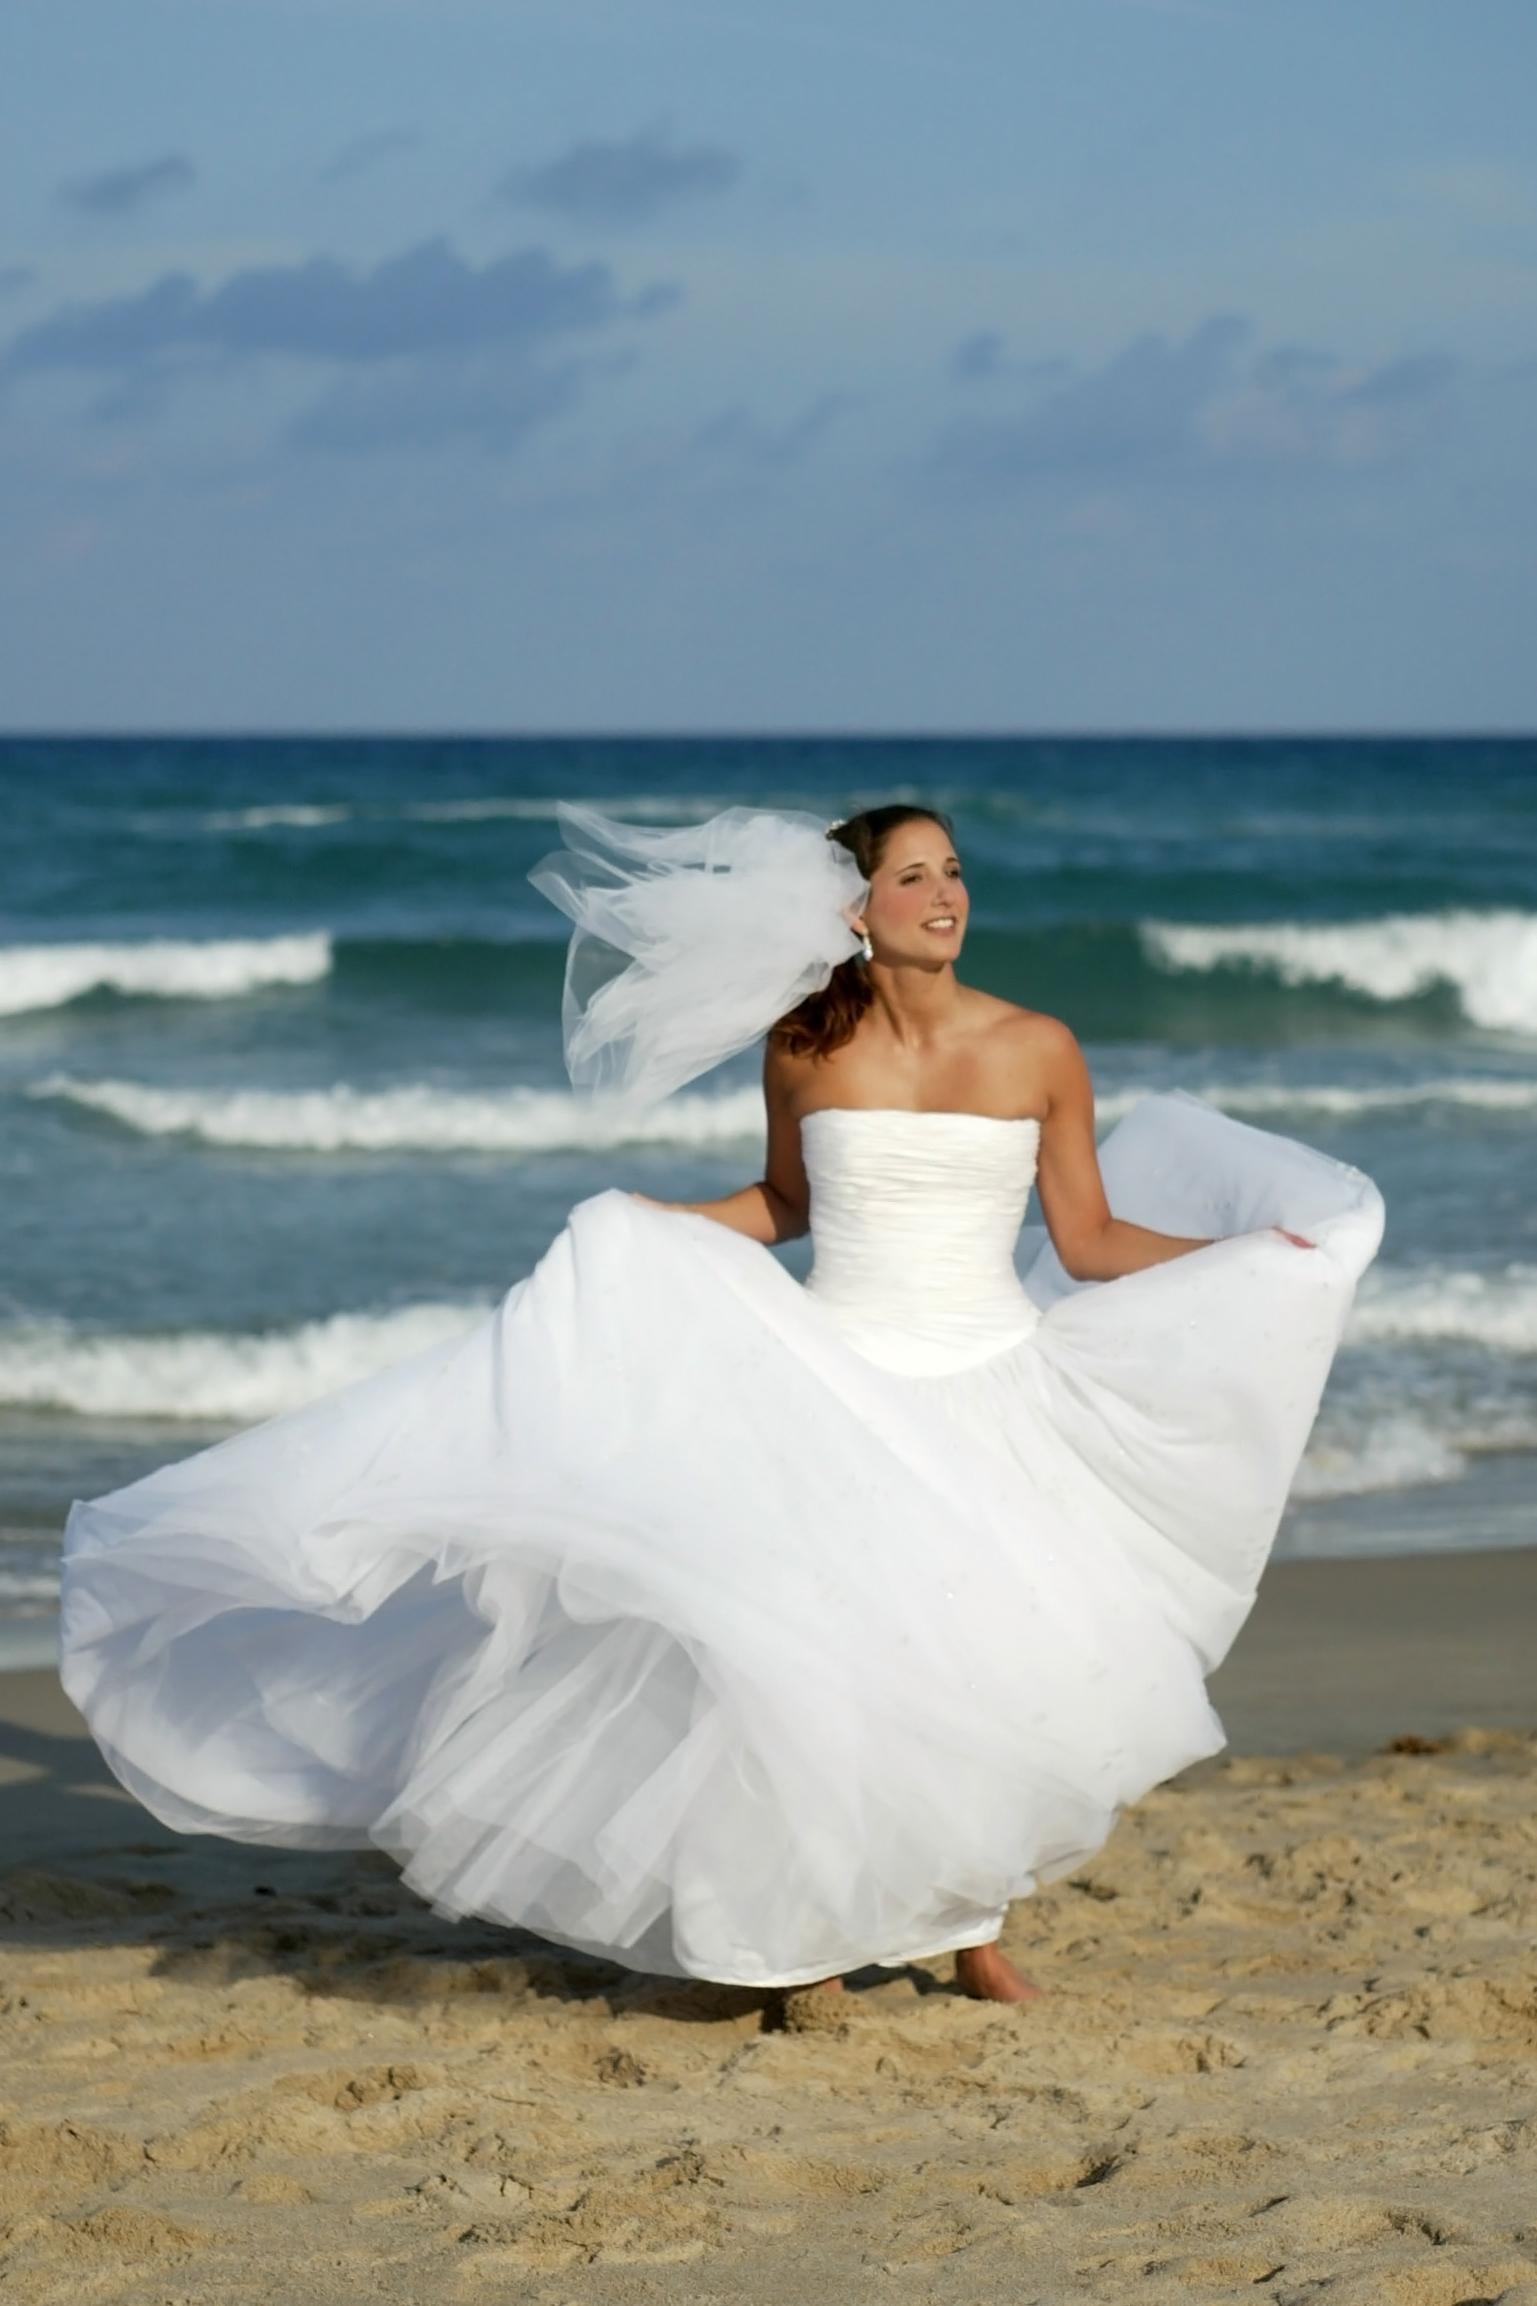 Best-destination-wedding-photography-axelphoto.jpg